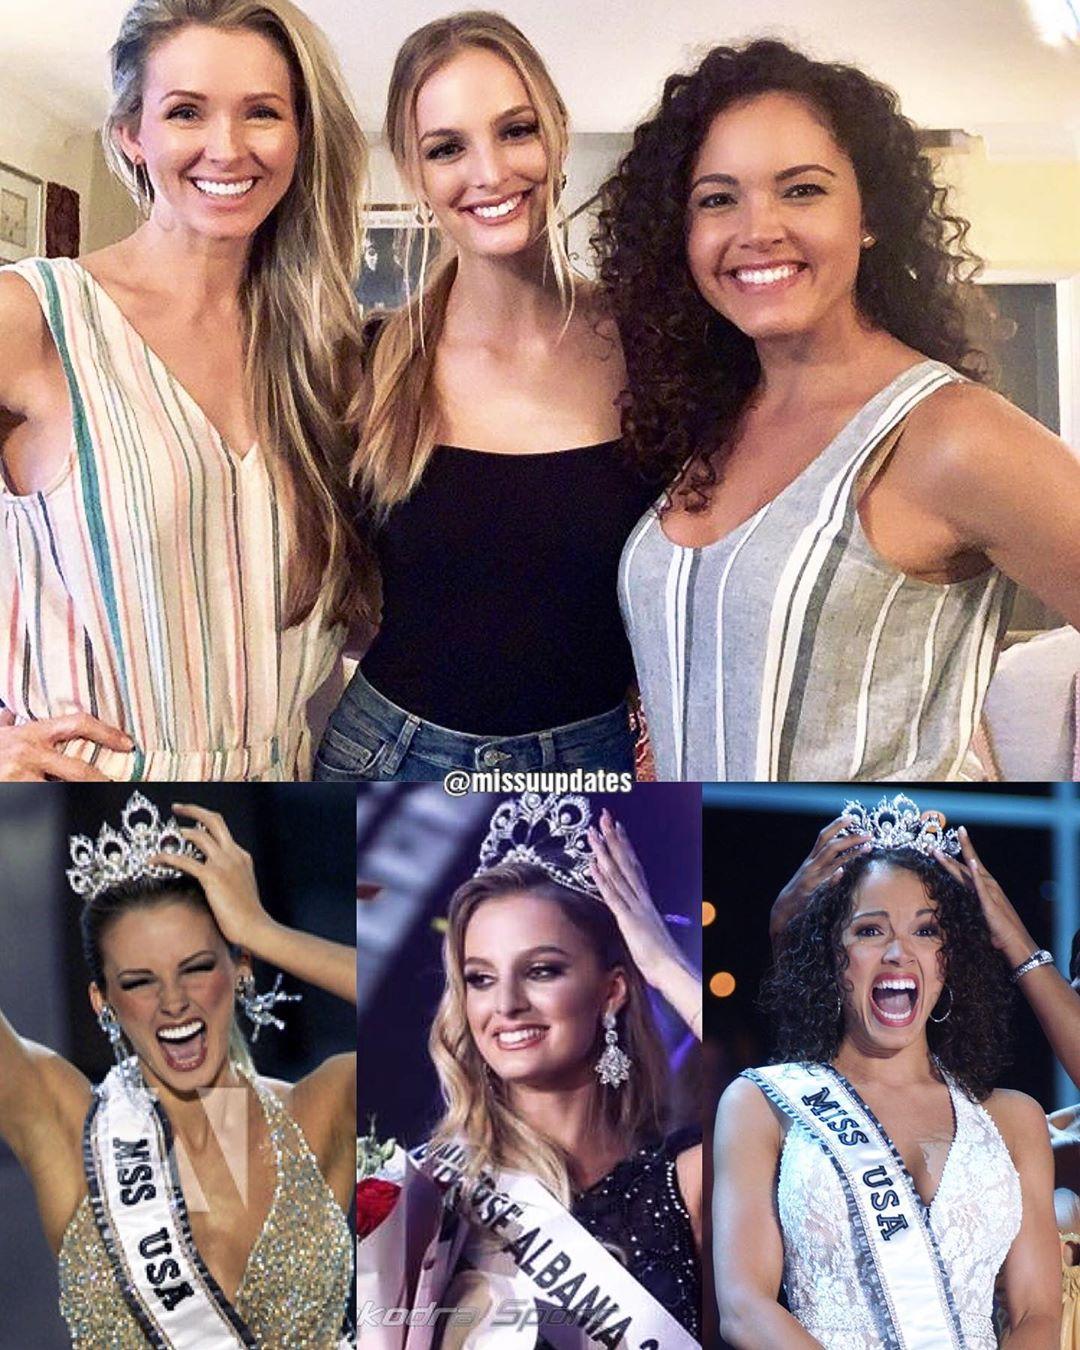 miss usa 2004 (top 2 de miss universe 2004), miss universe albania 2019, miss usa 2003 (top 15 de miss universe 2003). E3btxtgk